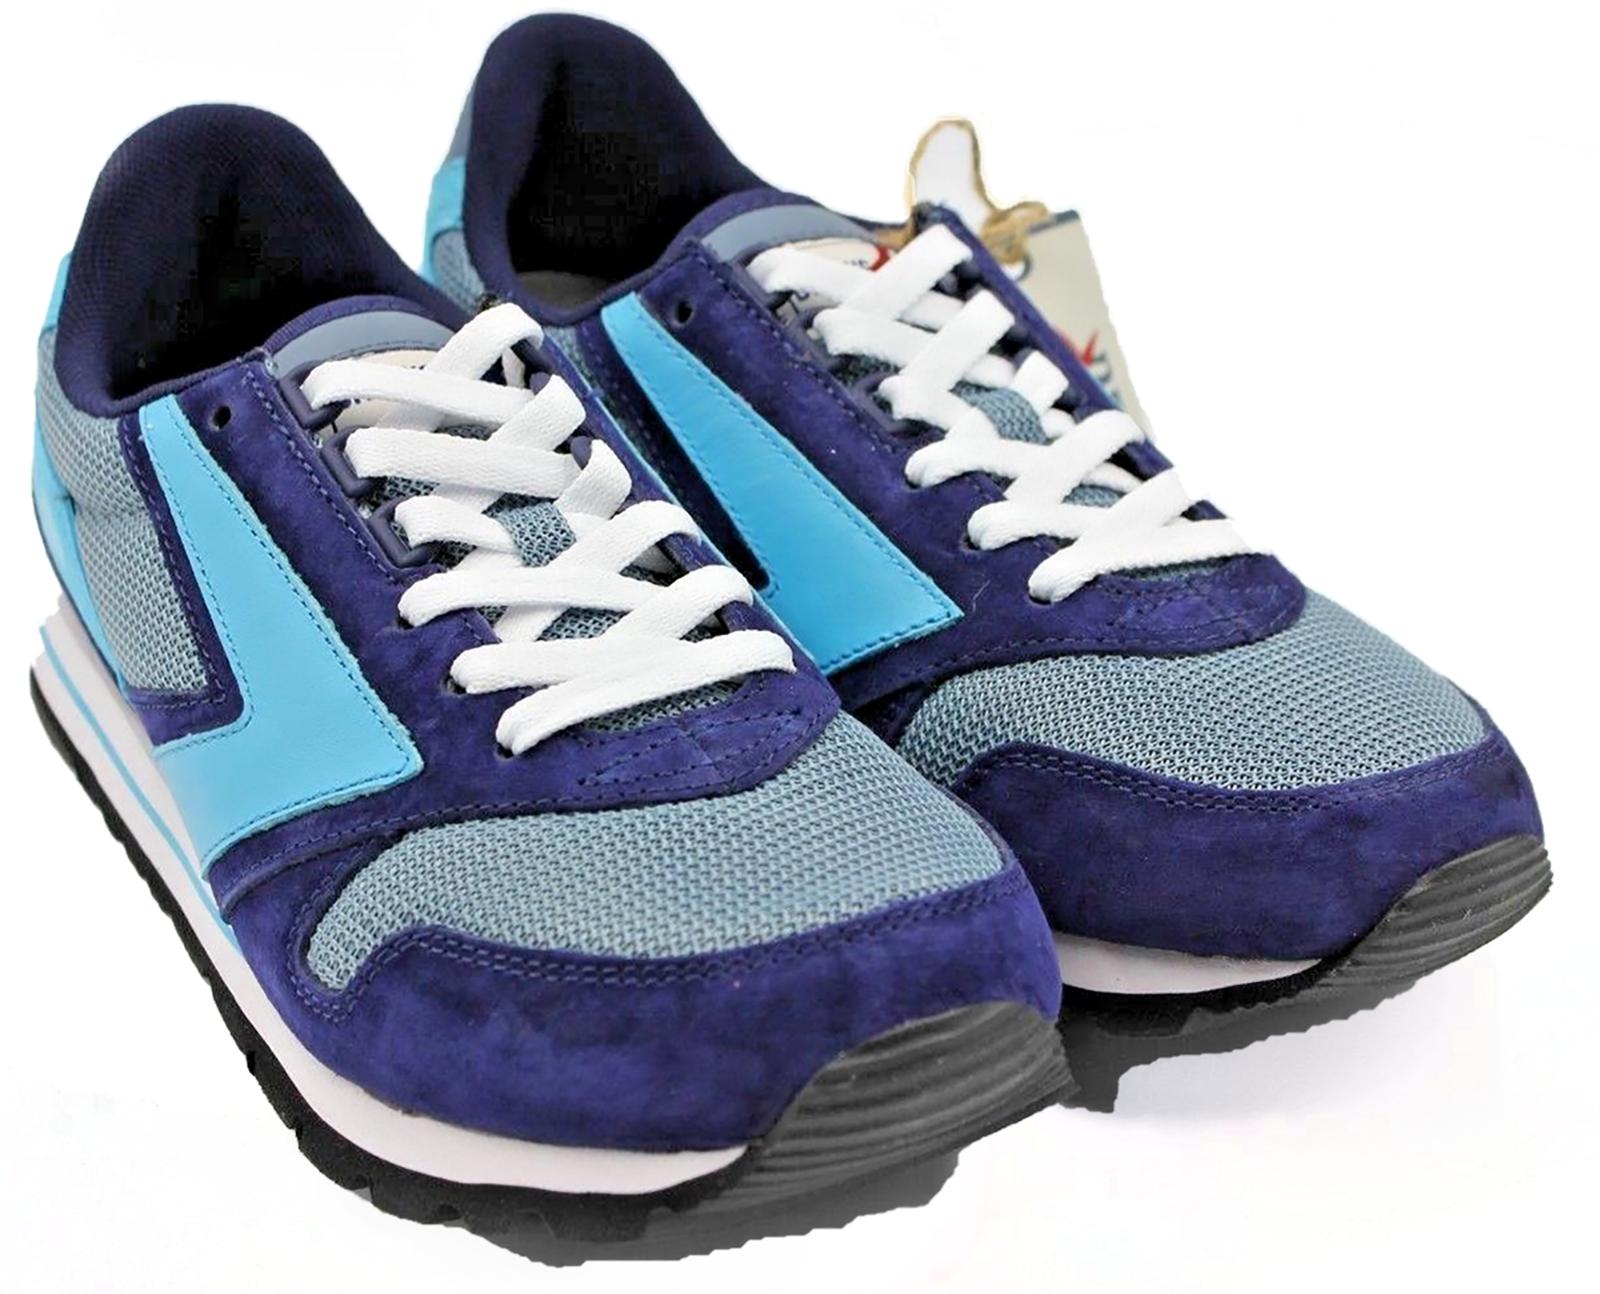 BROOKS Chariot River bluee bluee Mirage Evening bluee Men's Tennis shoes - NEW